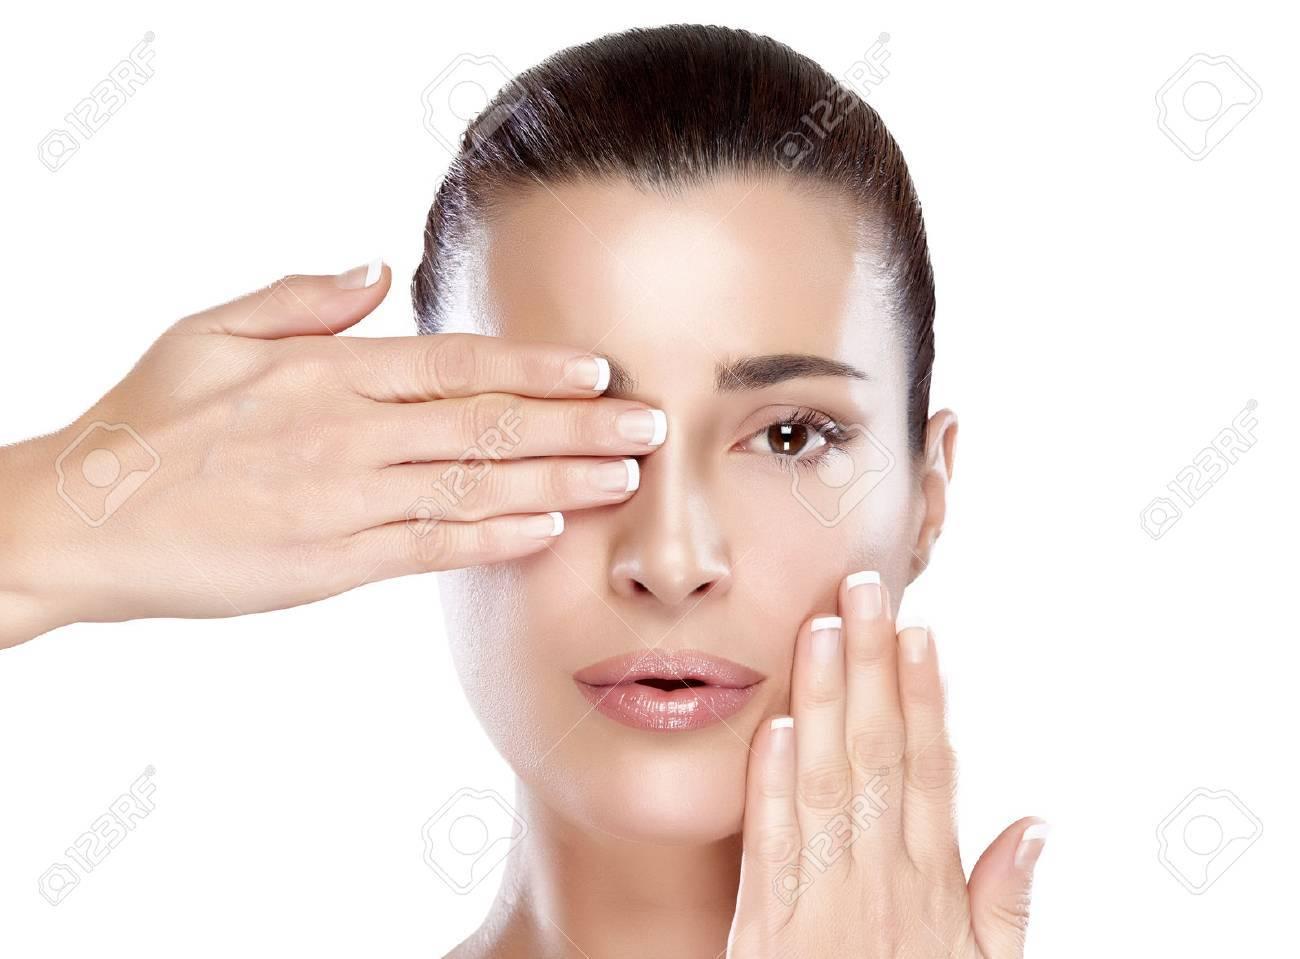 huid verzorging gezicht